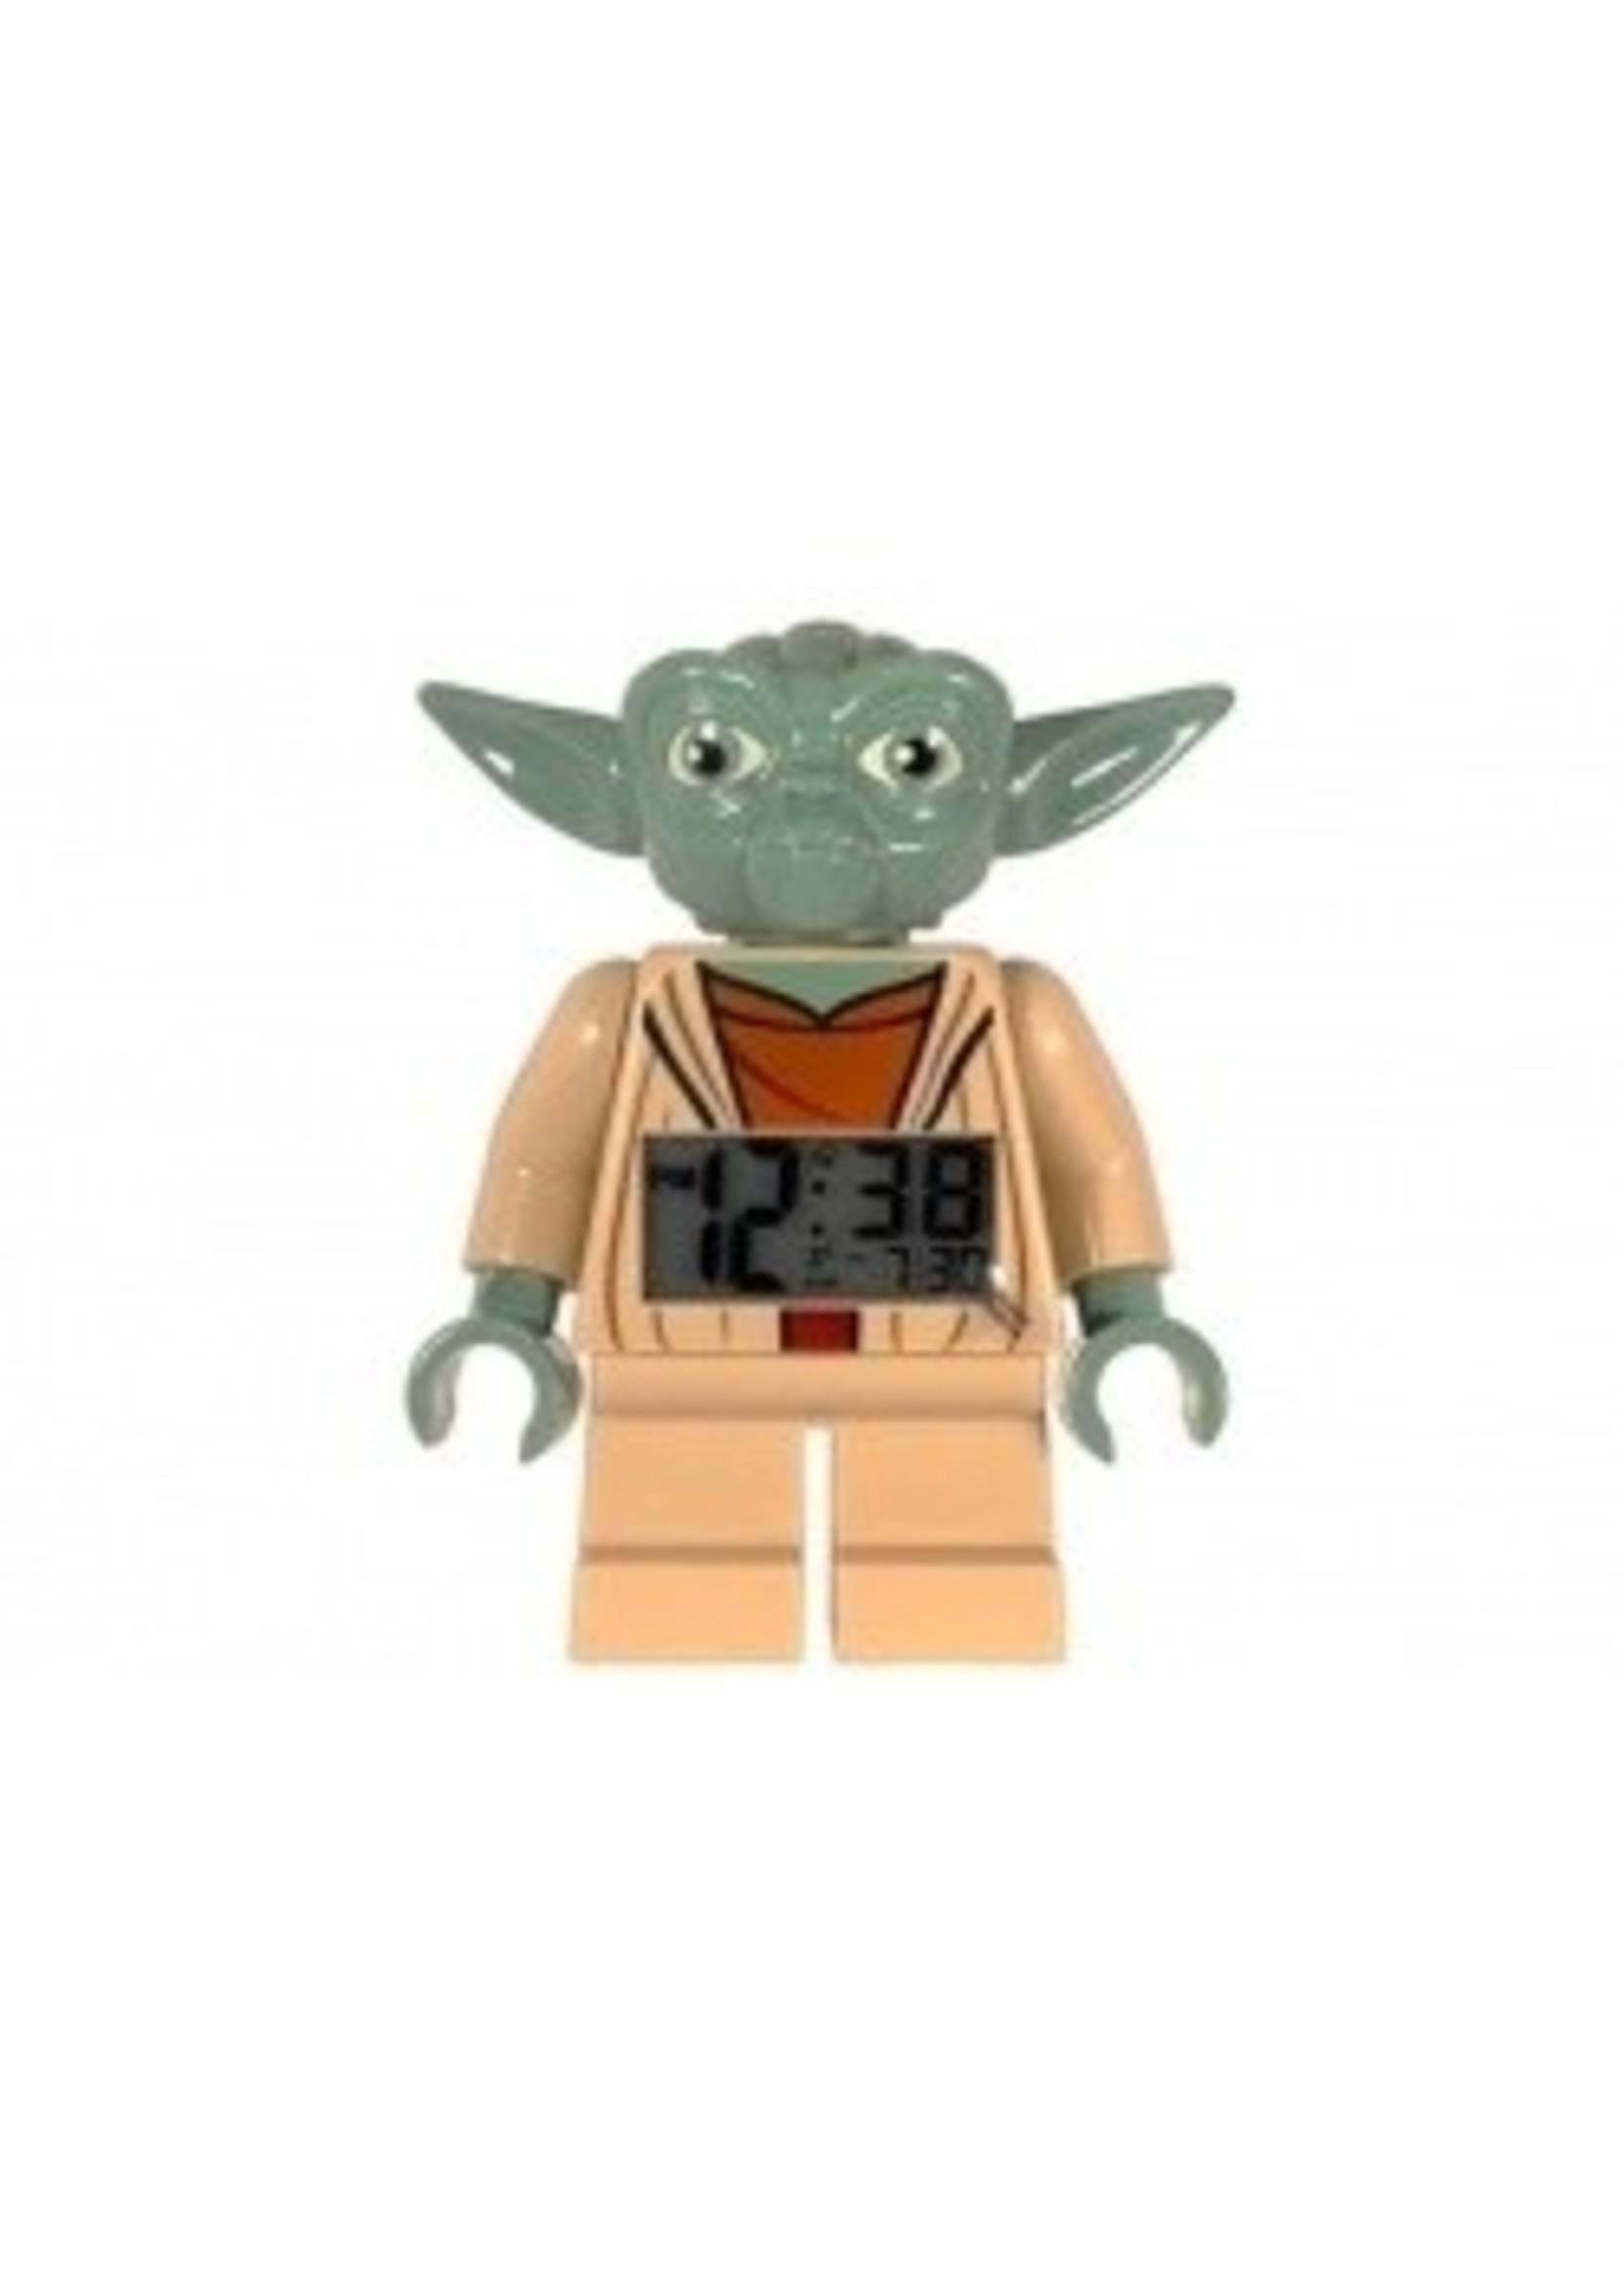 LEGO Star Wars Yoda Klok Wekker LEG-9003080